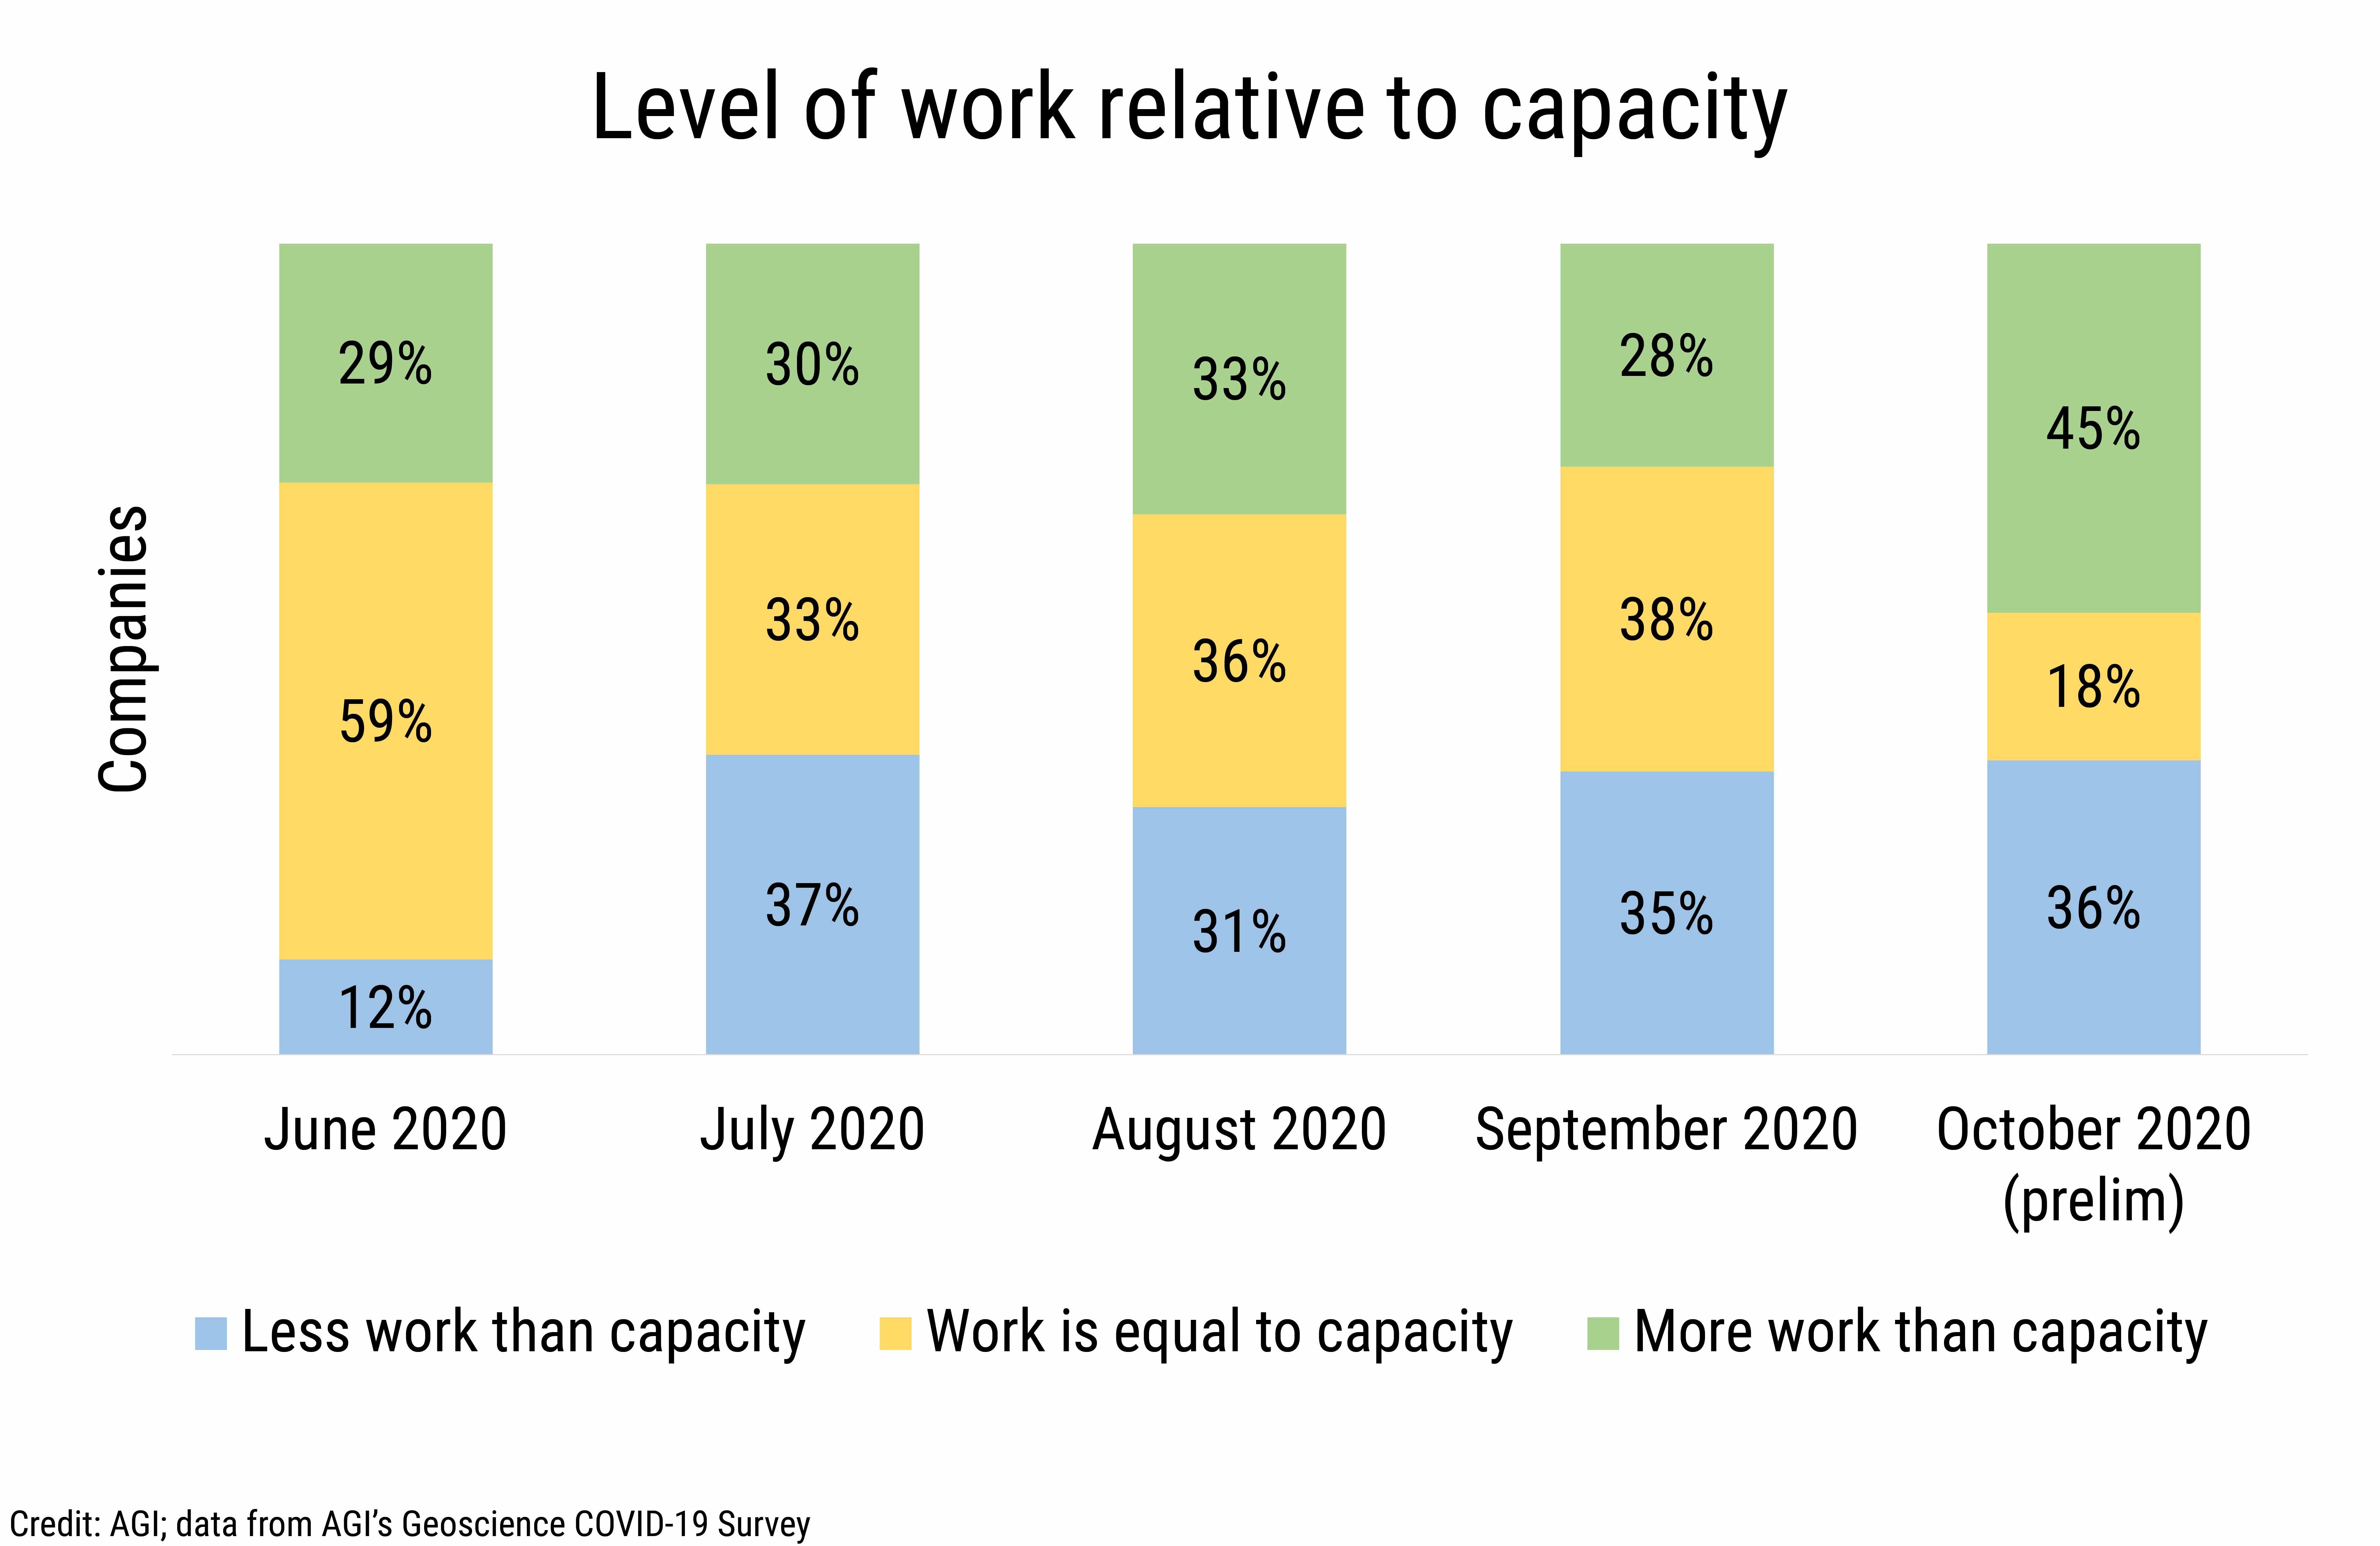 DB_2020-027 chart 02:  Level of work relative to capacity (Credit: AGI; data from AGI's Geoscience COVID-19 Survey)